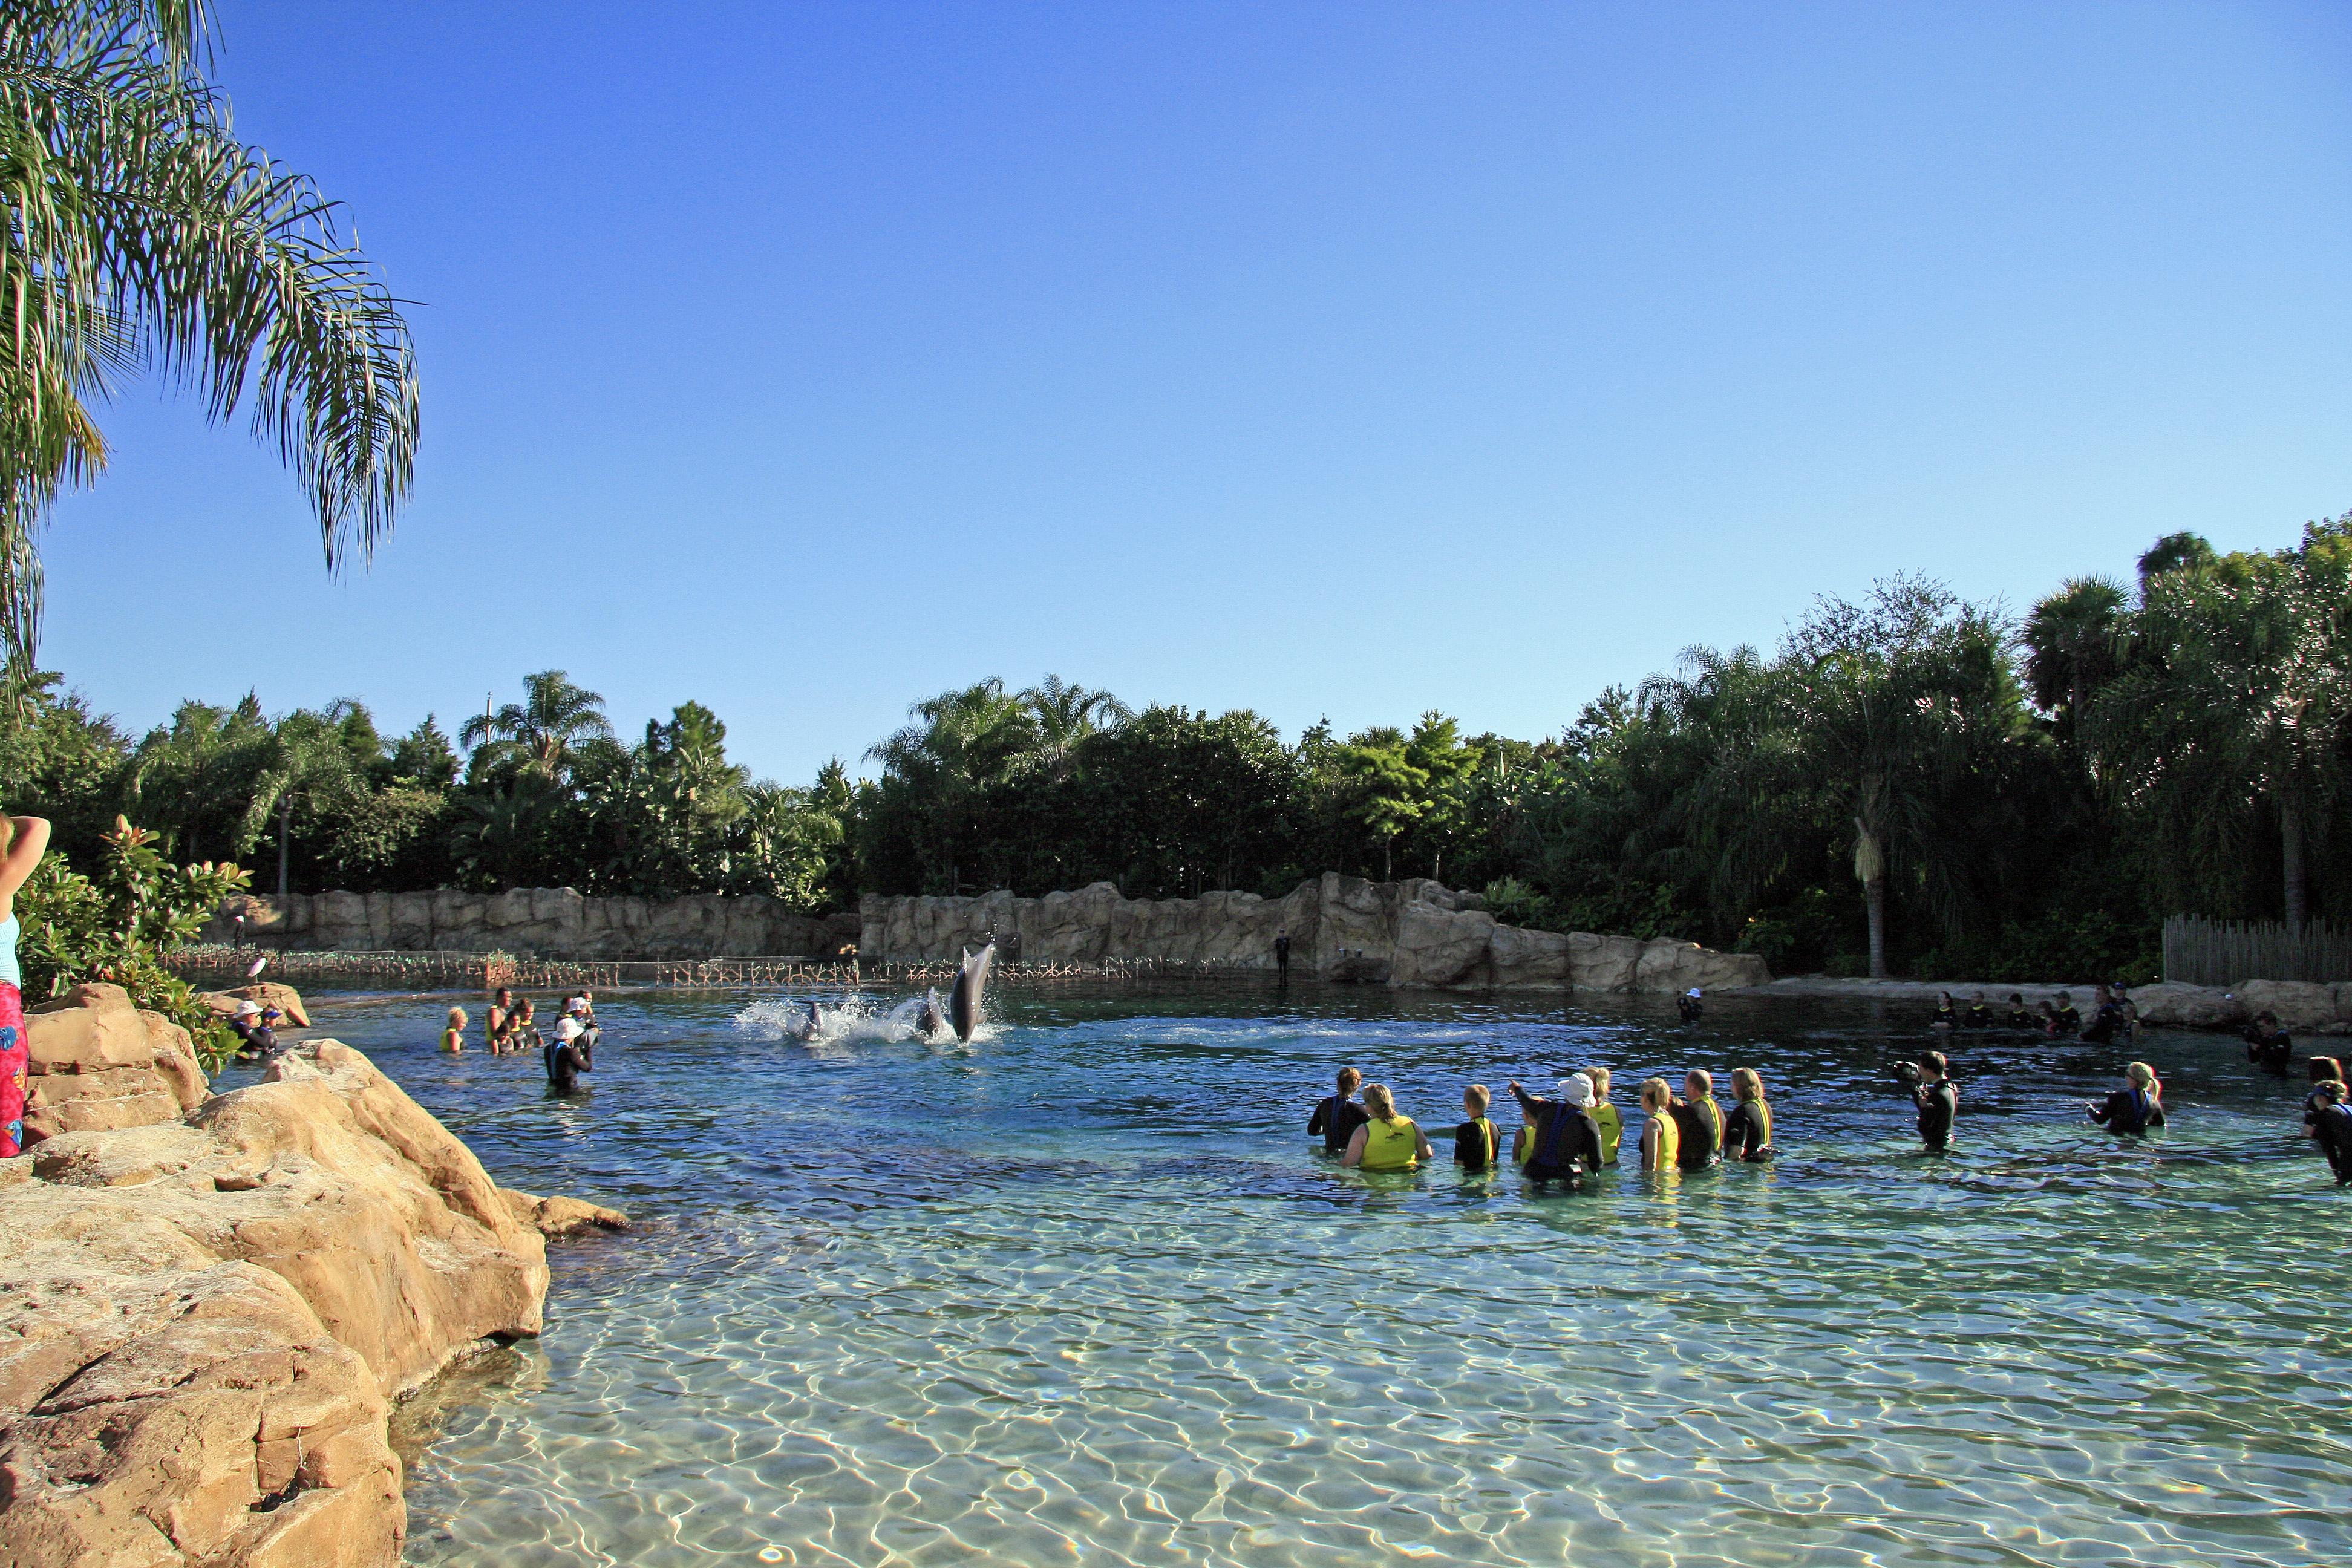 Where to Go In Orlando? 6 Best Alternatives to Disney World